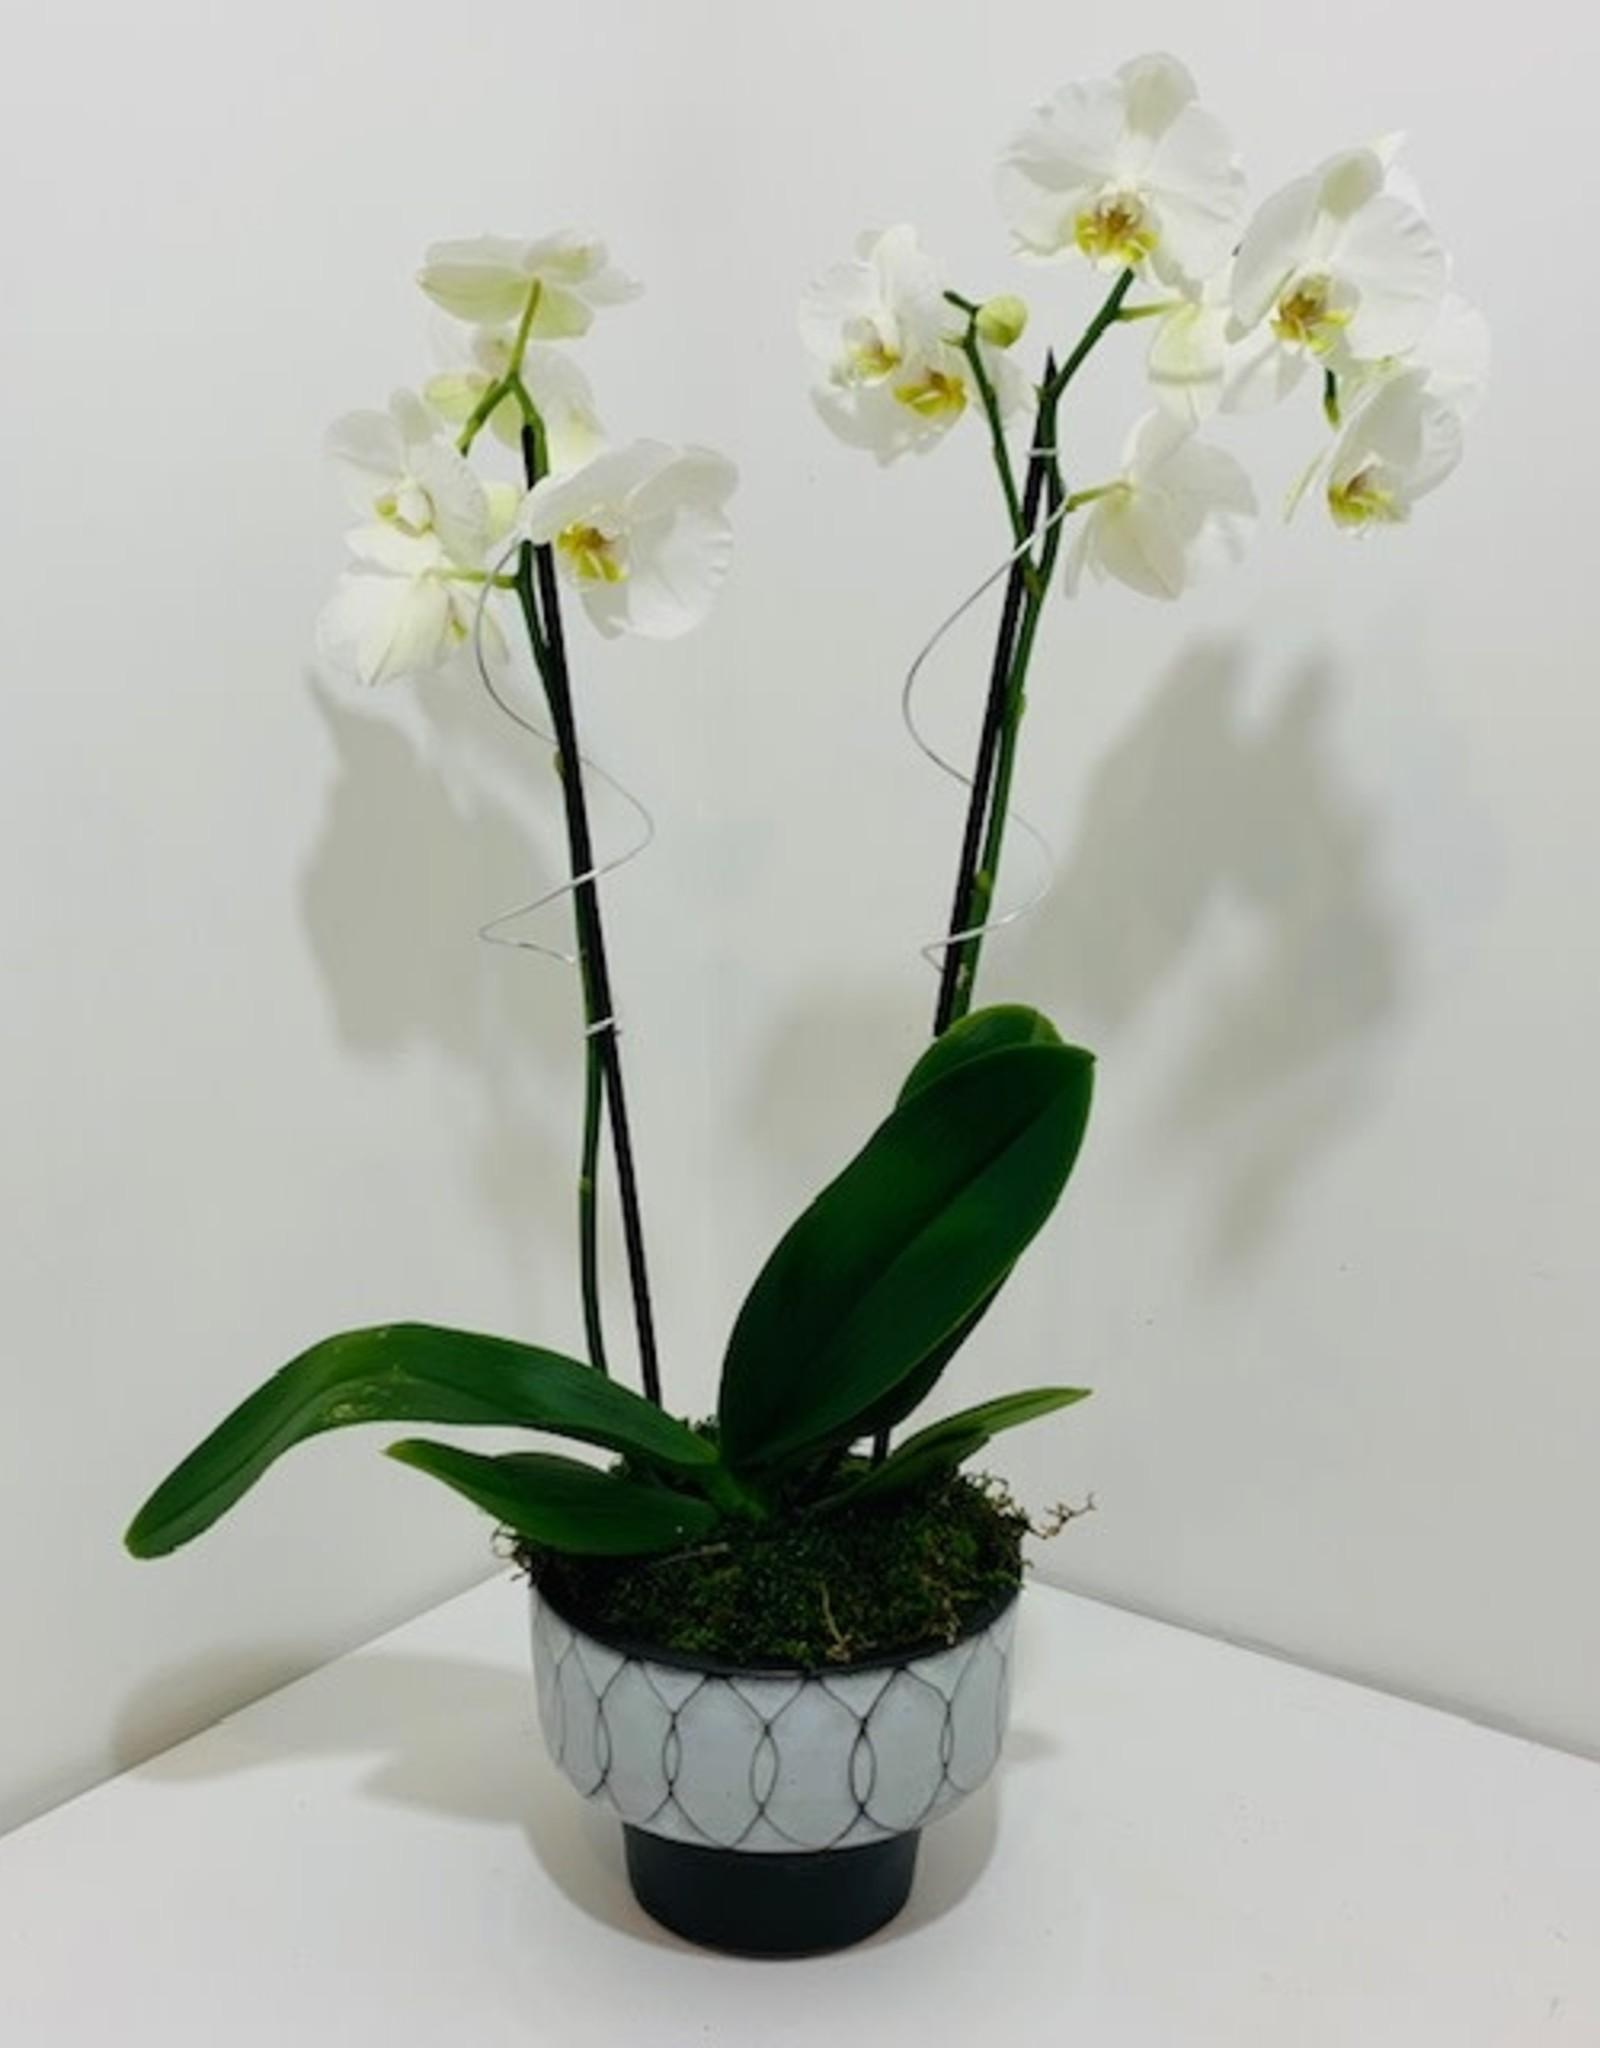 Double Stem White Orchid in Black & White Ceramic Pot